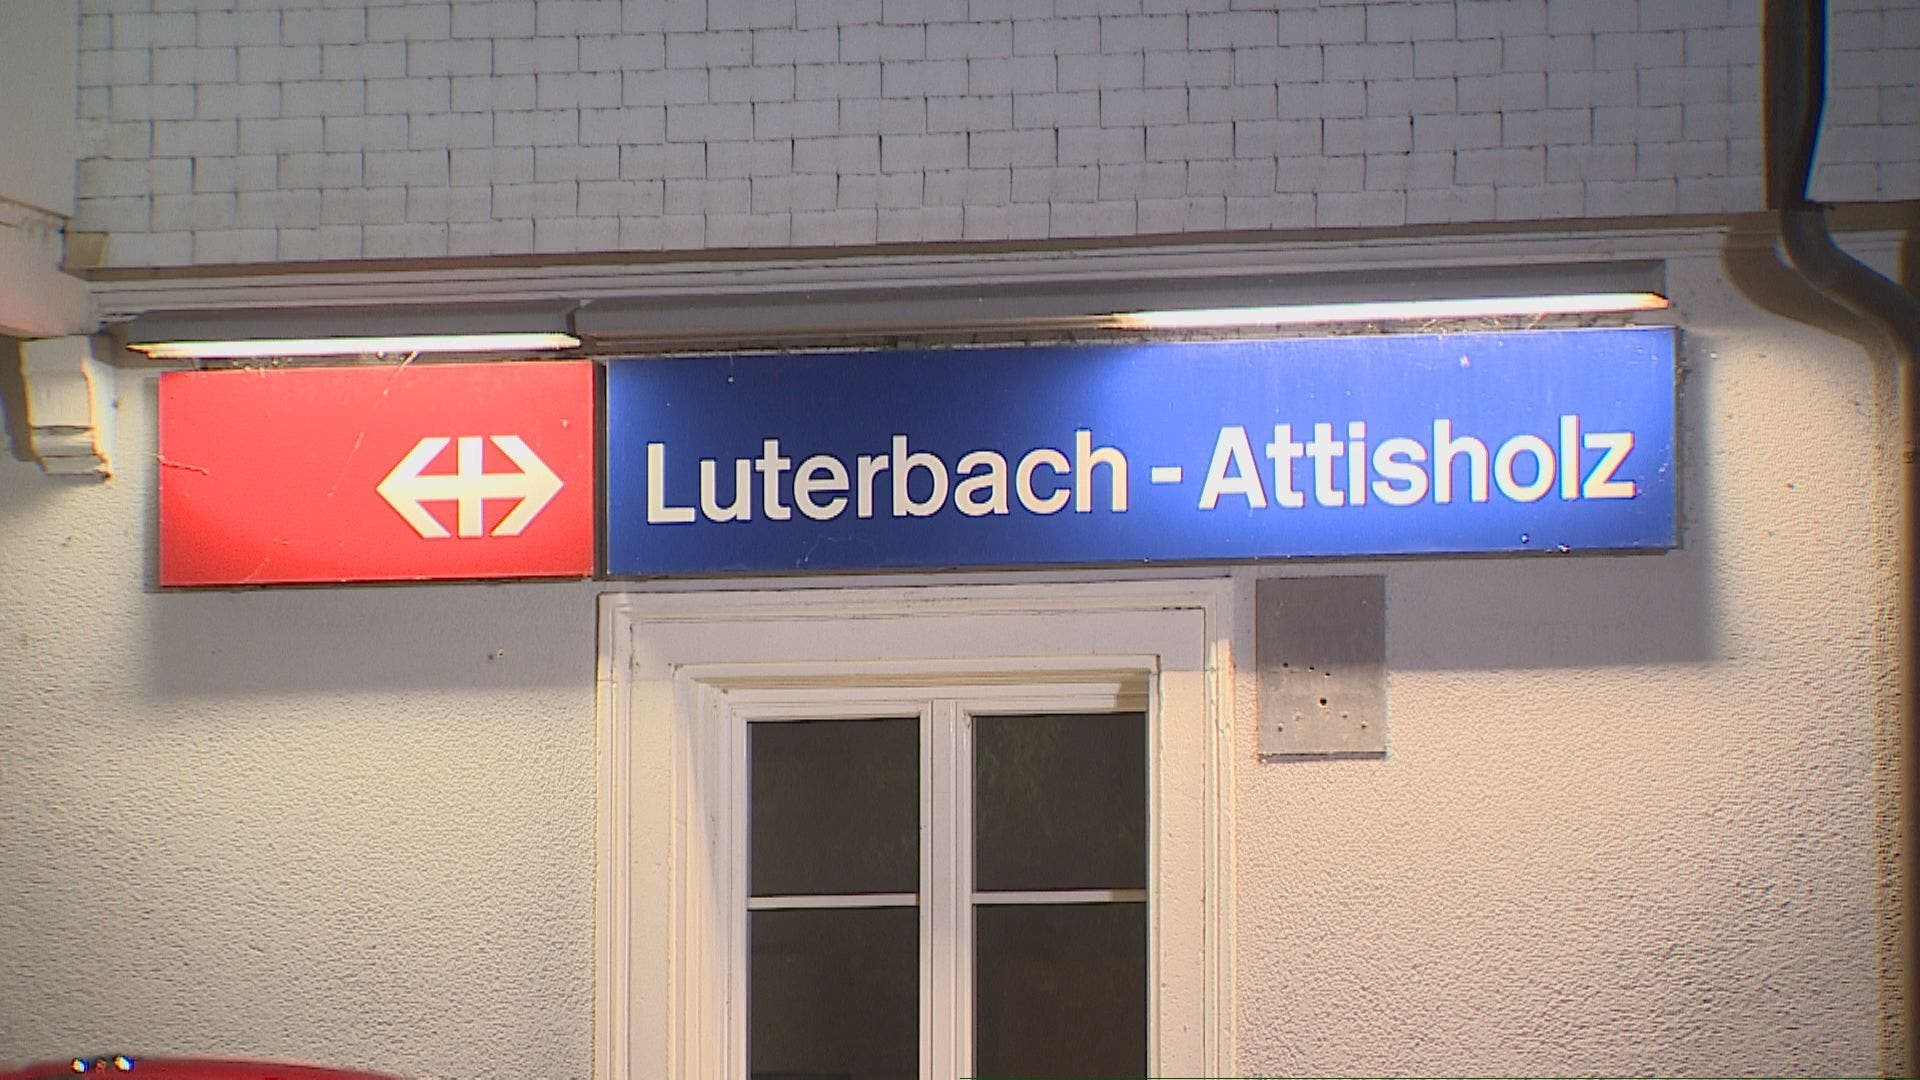 Chemieunfall beim Bahnhof Luterbach-Attisholz am Sonntagabend.